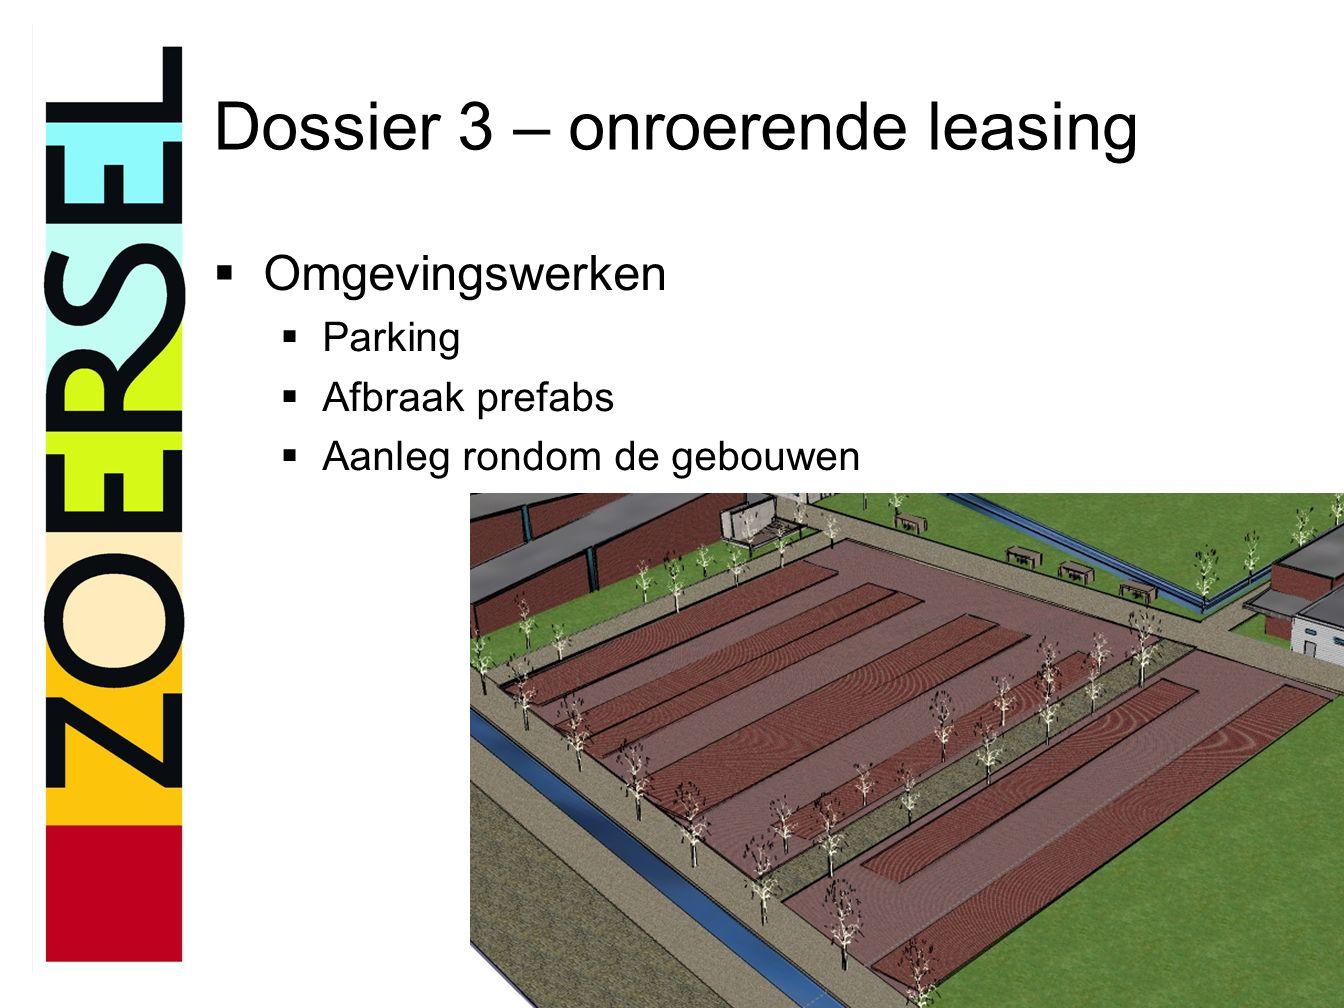 Dossier 3 – onroerende leasing  Omgevingswerken  Parking  Afbraak prefabs  Aanleg rondom de gebouwen